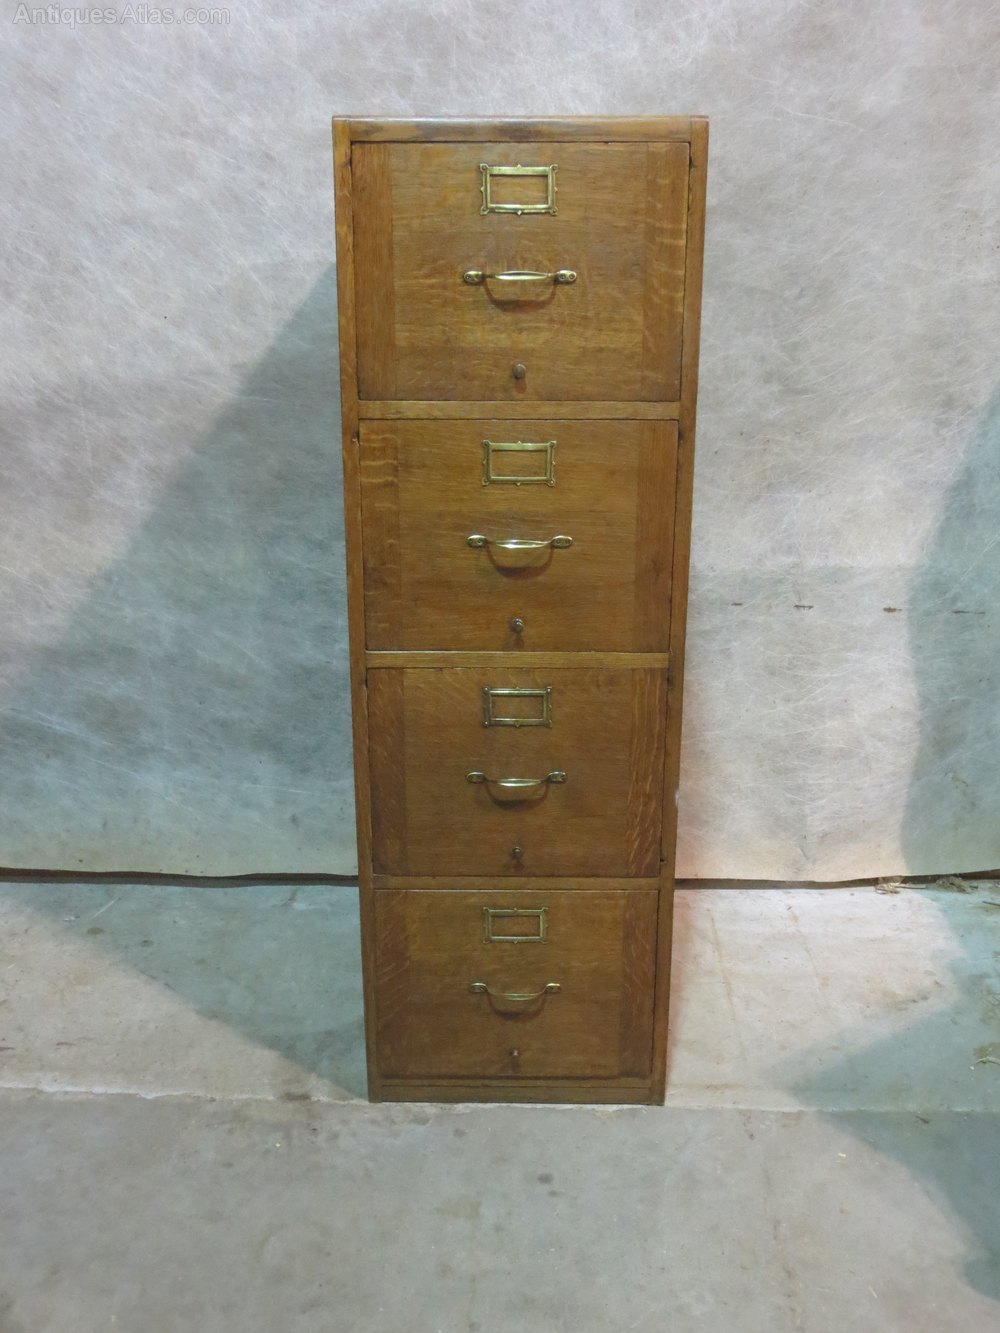 Pair of Oak Filing Cabinets Antique Filing Cabinets ... - Pair Of Oak Filing Cabinets - Antiques Atlas